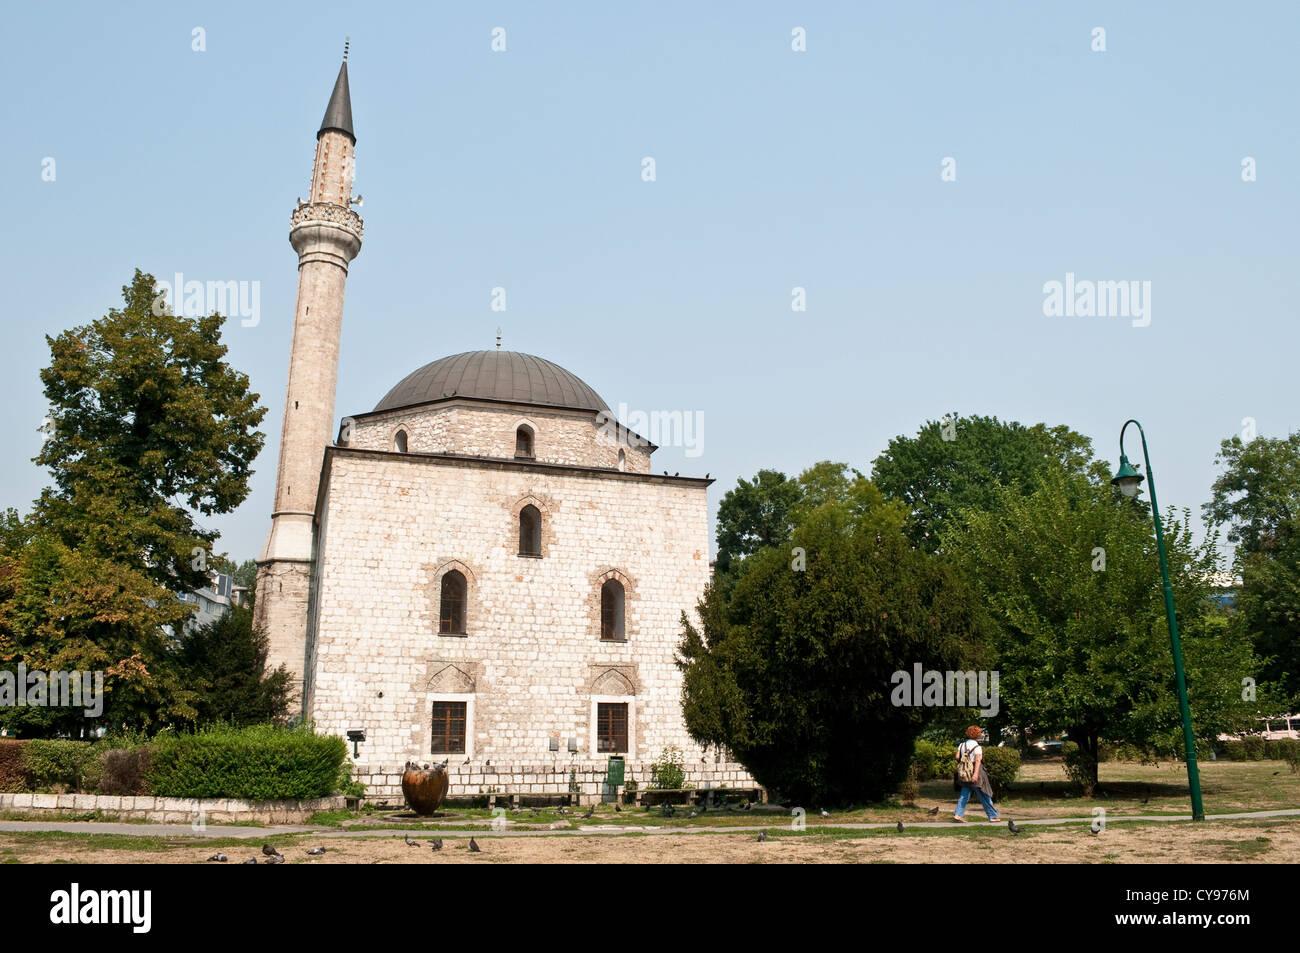 Alipasa Mosque, built in 1561, Sarajevo, Bosnia and Herzegovina - Stock Image